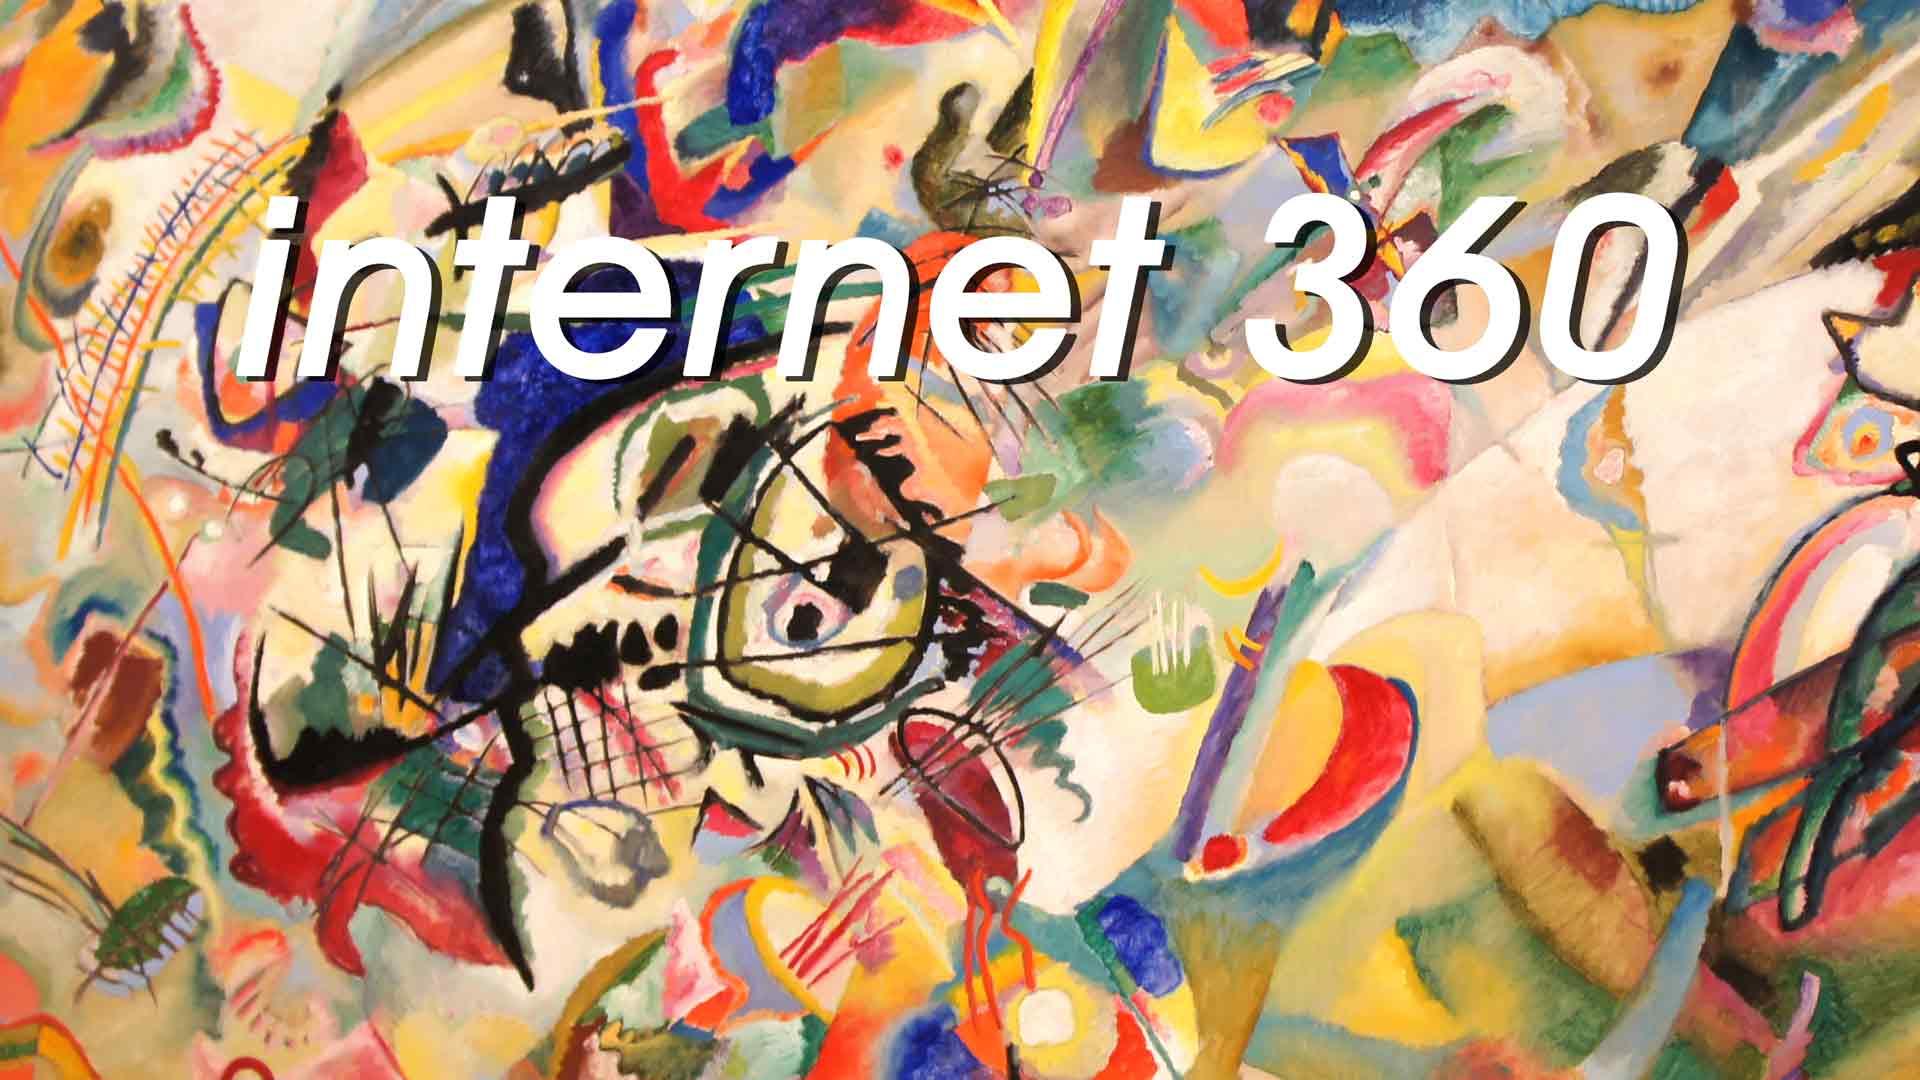 2internet360